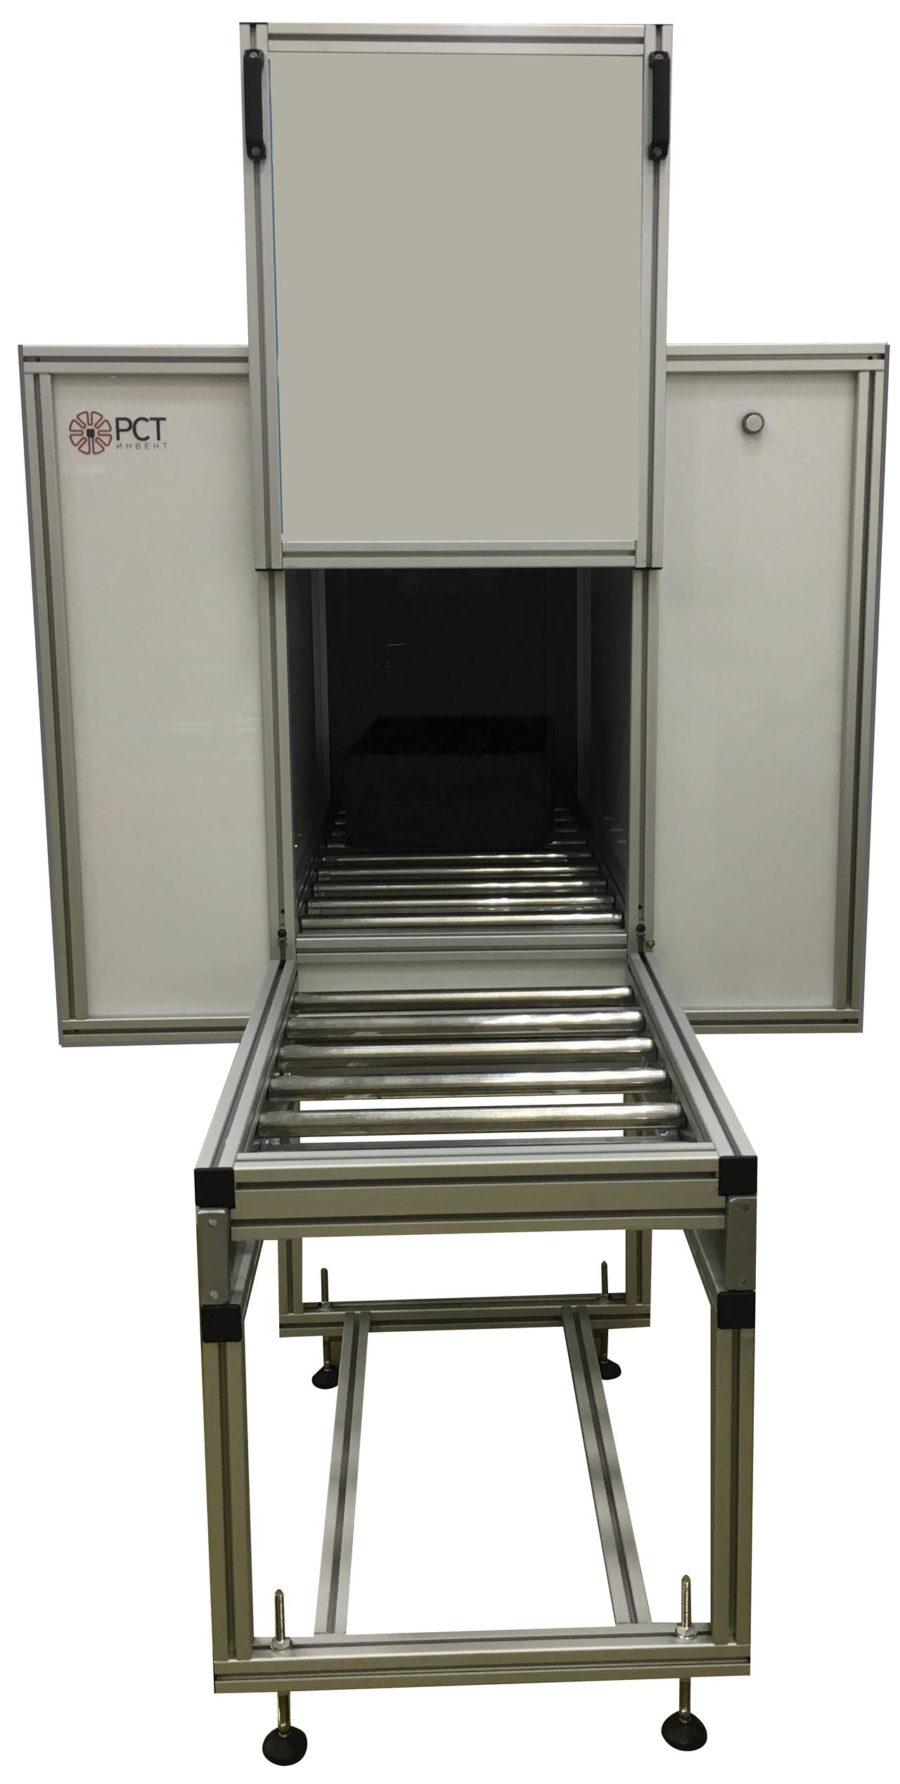 RFID-тоннель RST-NFT-001